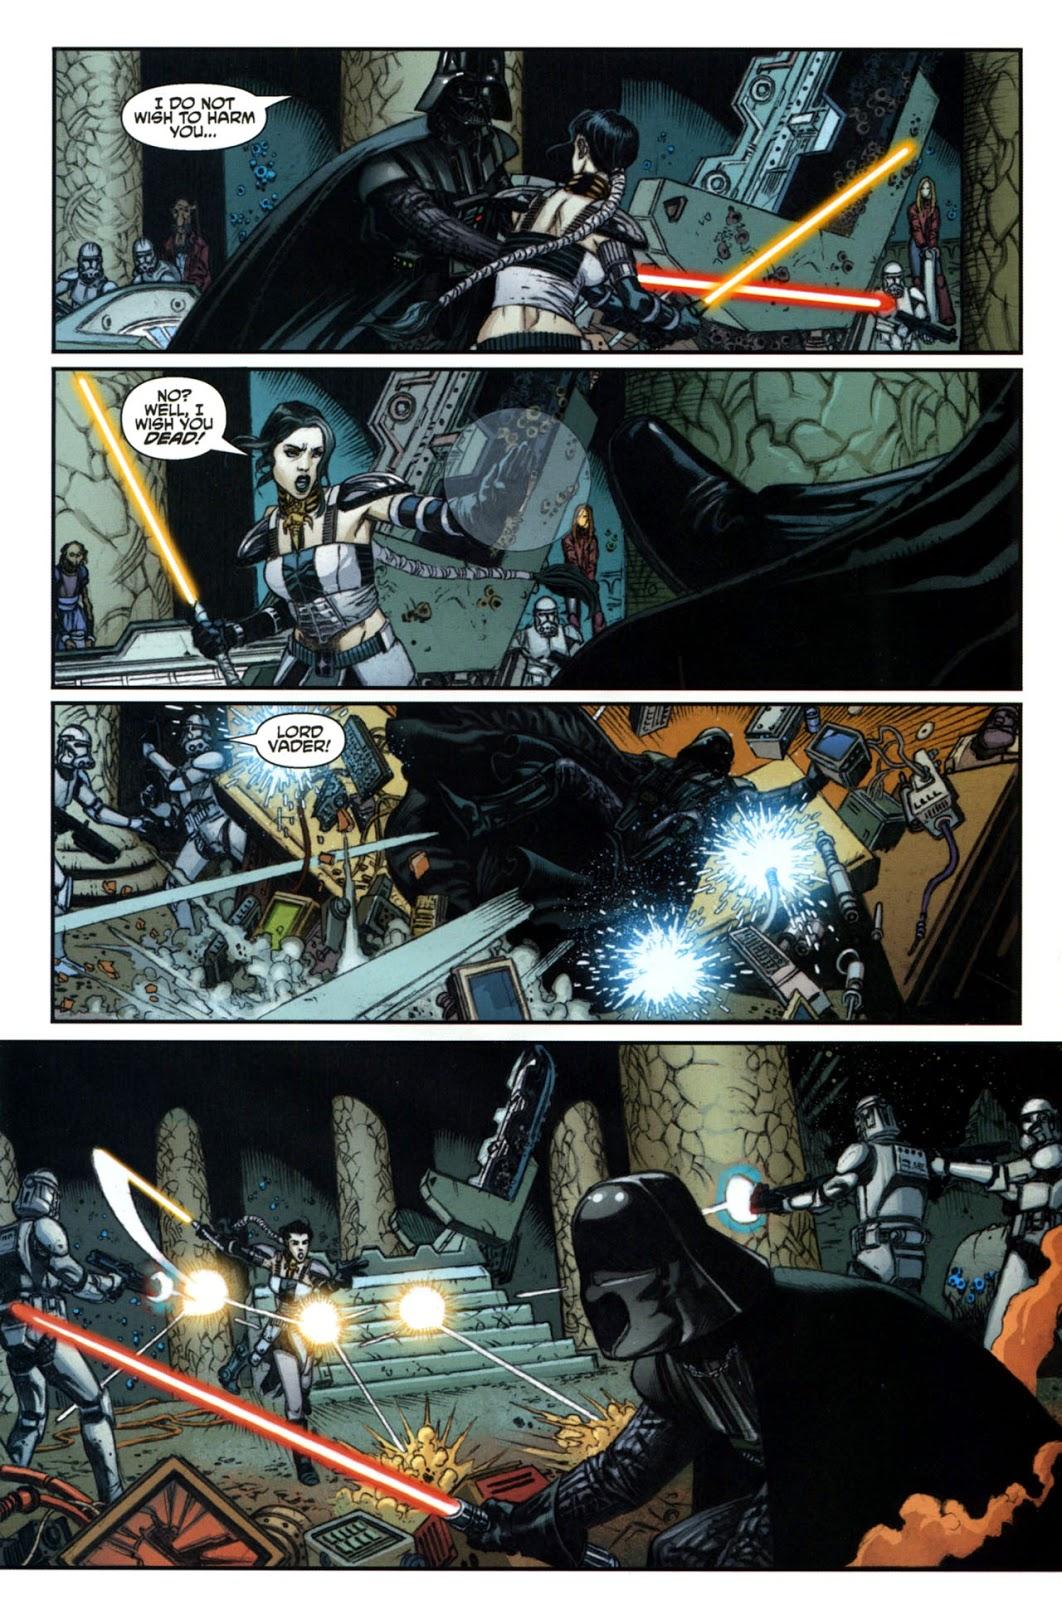 Darth Vader vs A'Sharad Hett - Page 3 Pu6gOPSf7kkSq_zZsYlsBqCN8882UewUSB5v468iiuhmNrR3bh27KoQ6SUydofzMdf3_f41i5s9sq8hOLl4_TYpmCjvKd7Yt5L0Vdg2rEC7nLgrOew29atVlEUThHYKfbBsIUF1f